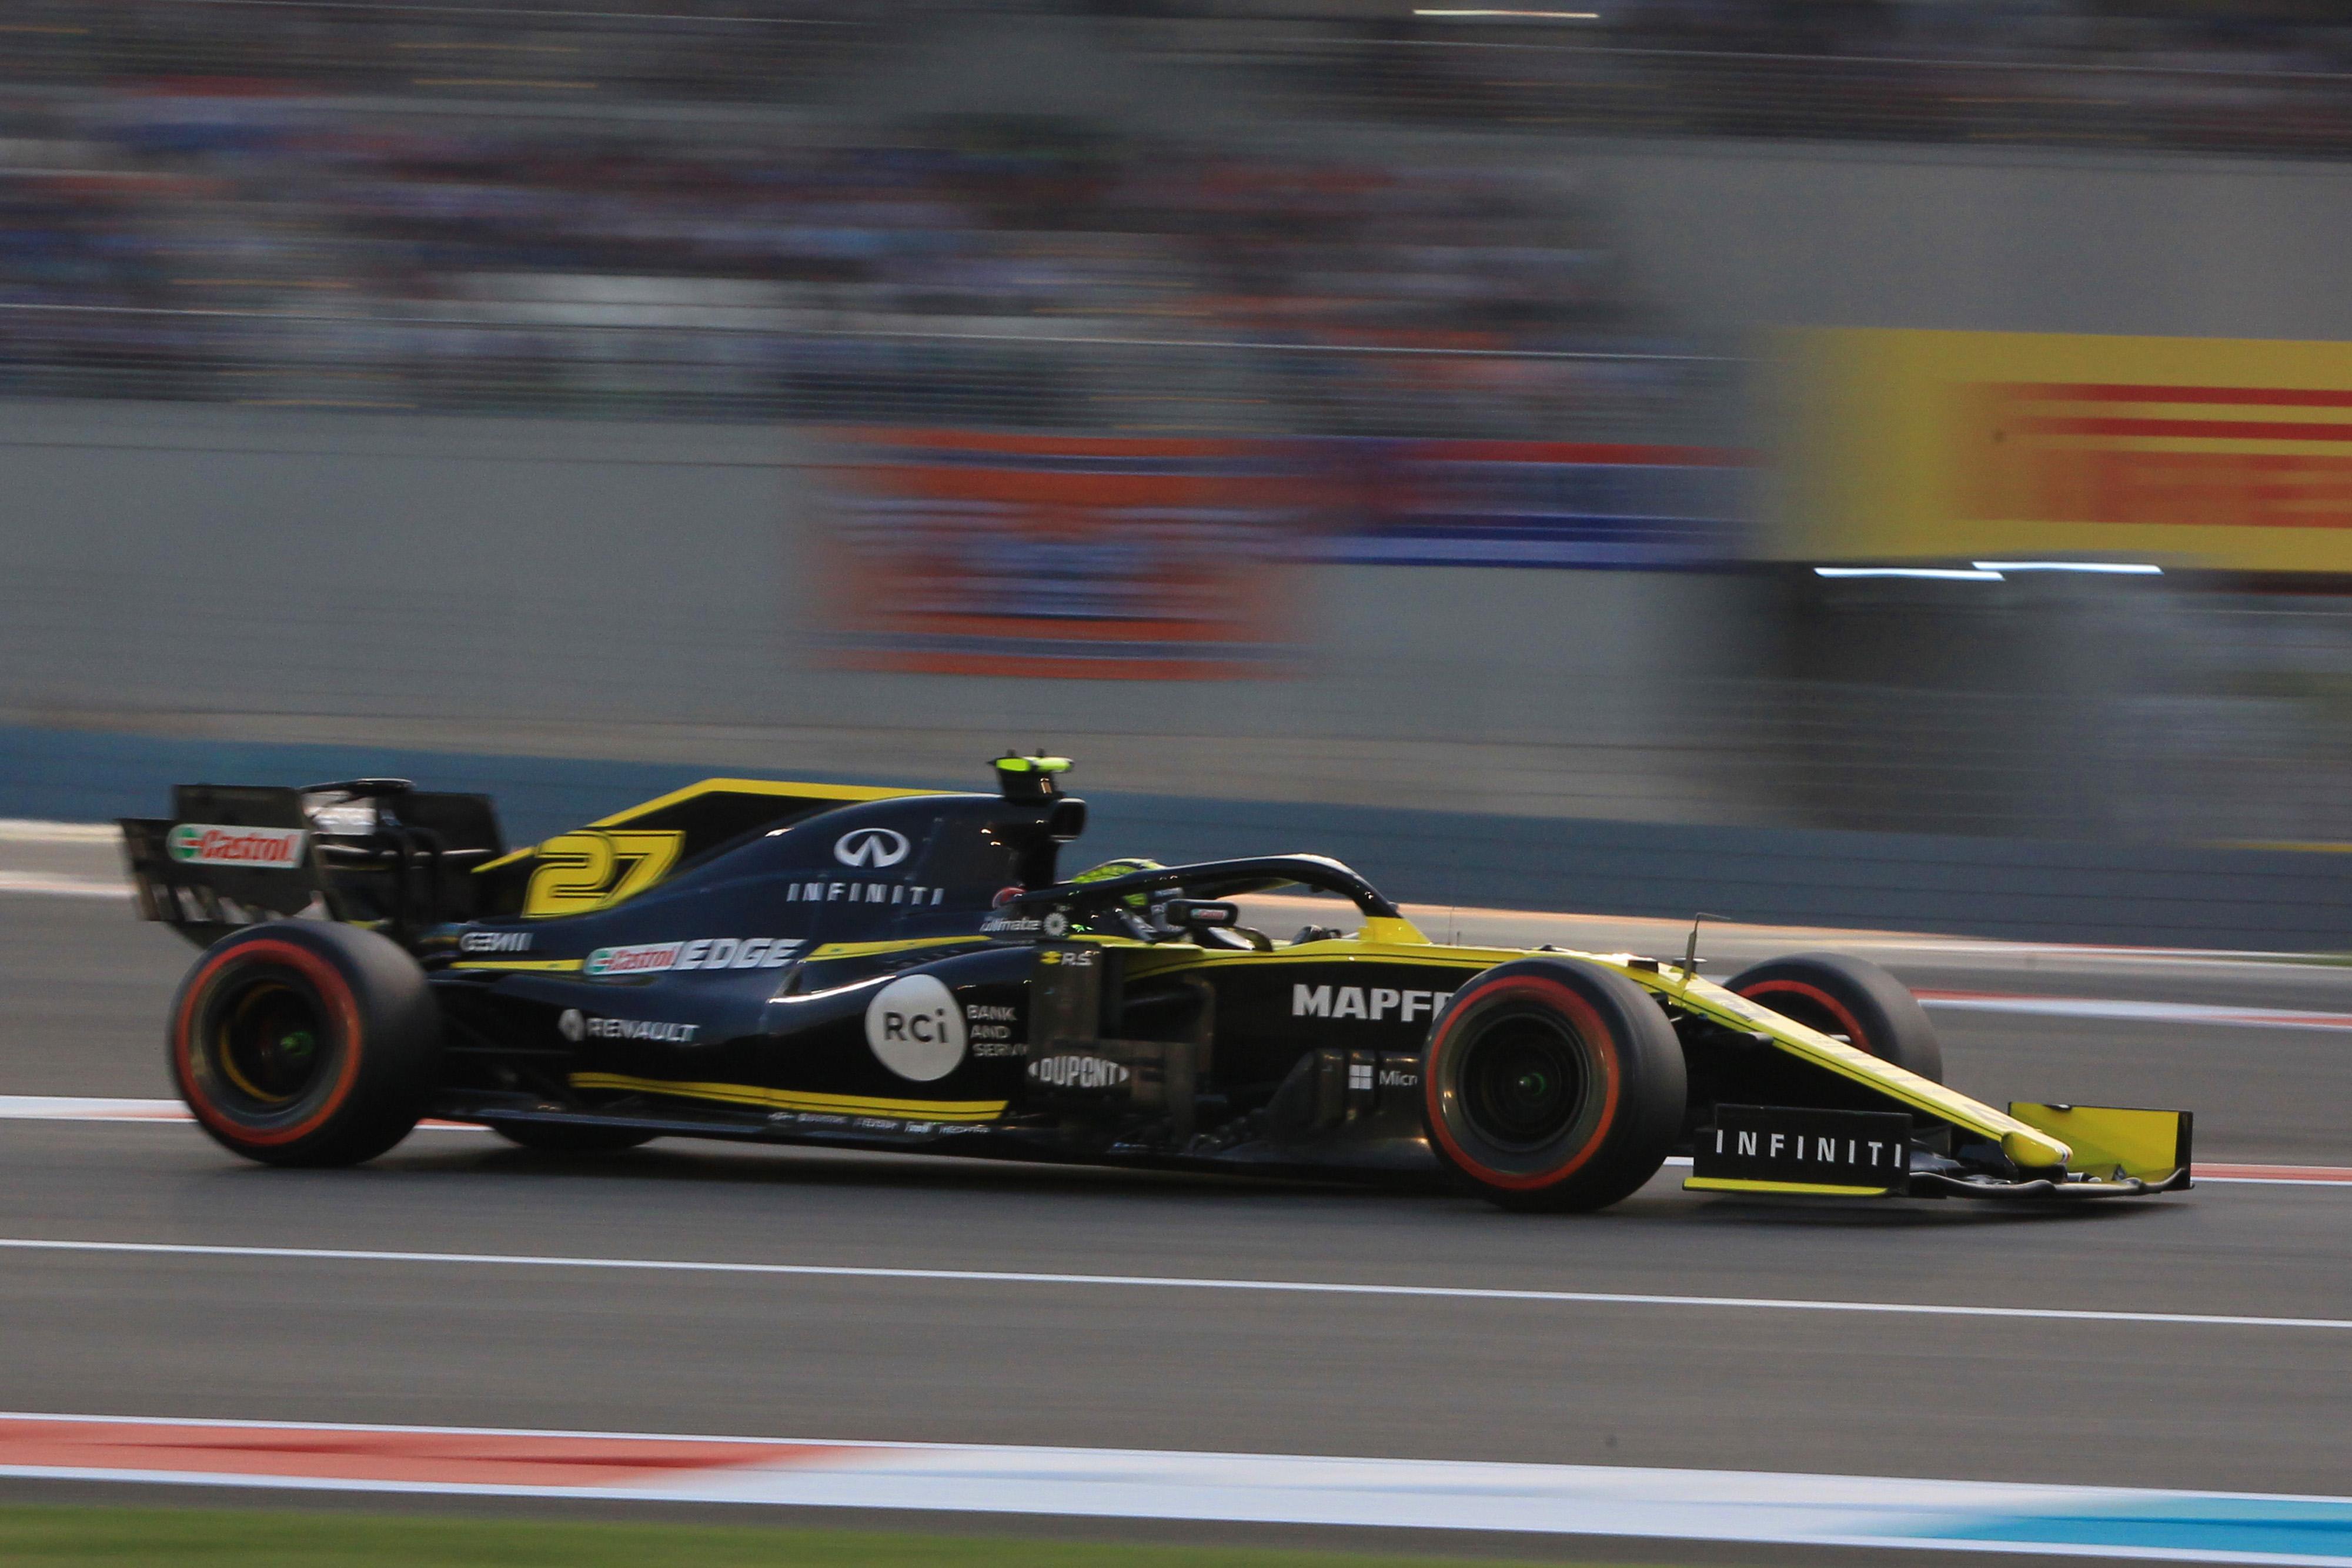 F1 Formula 1 Formula One Renault Nico Hulkenberg championship points